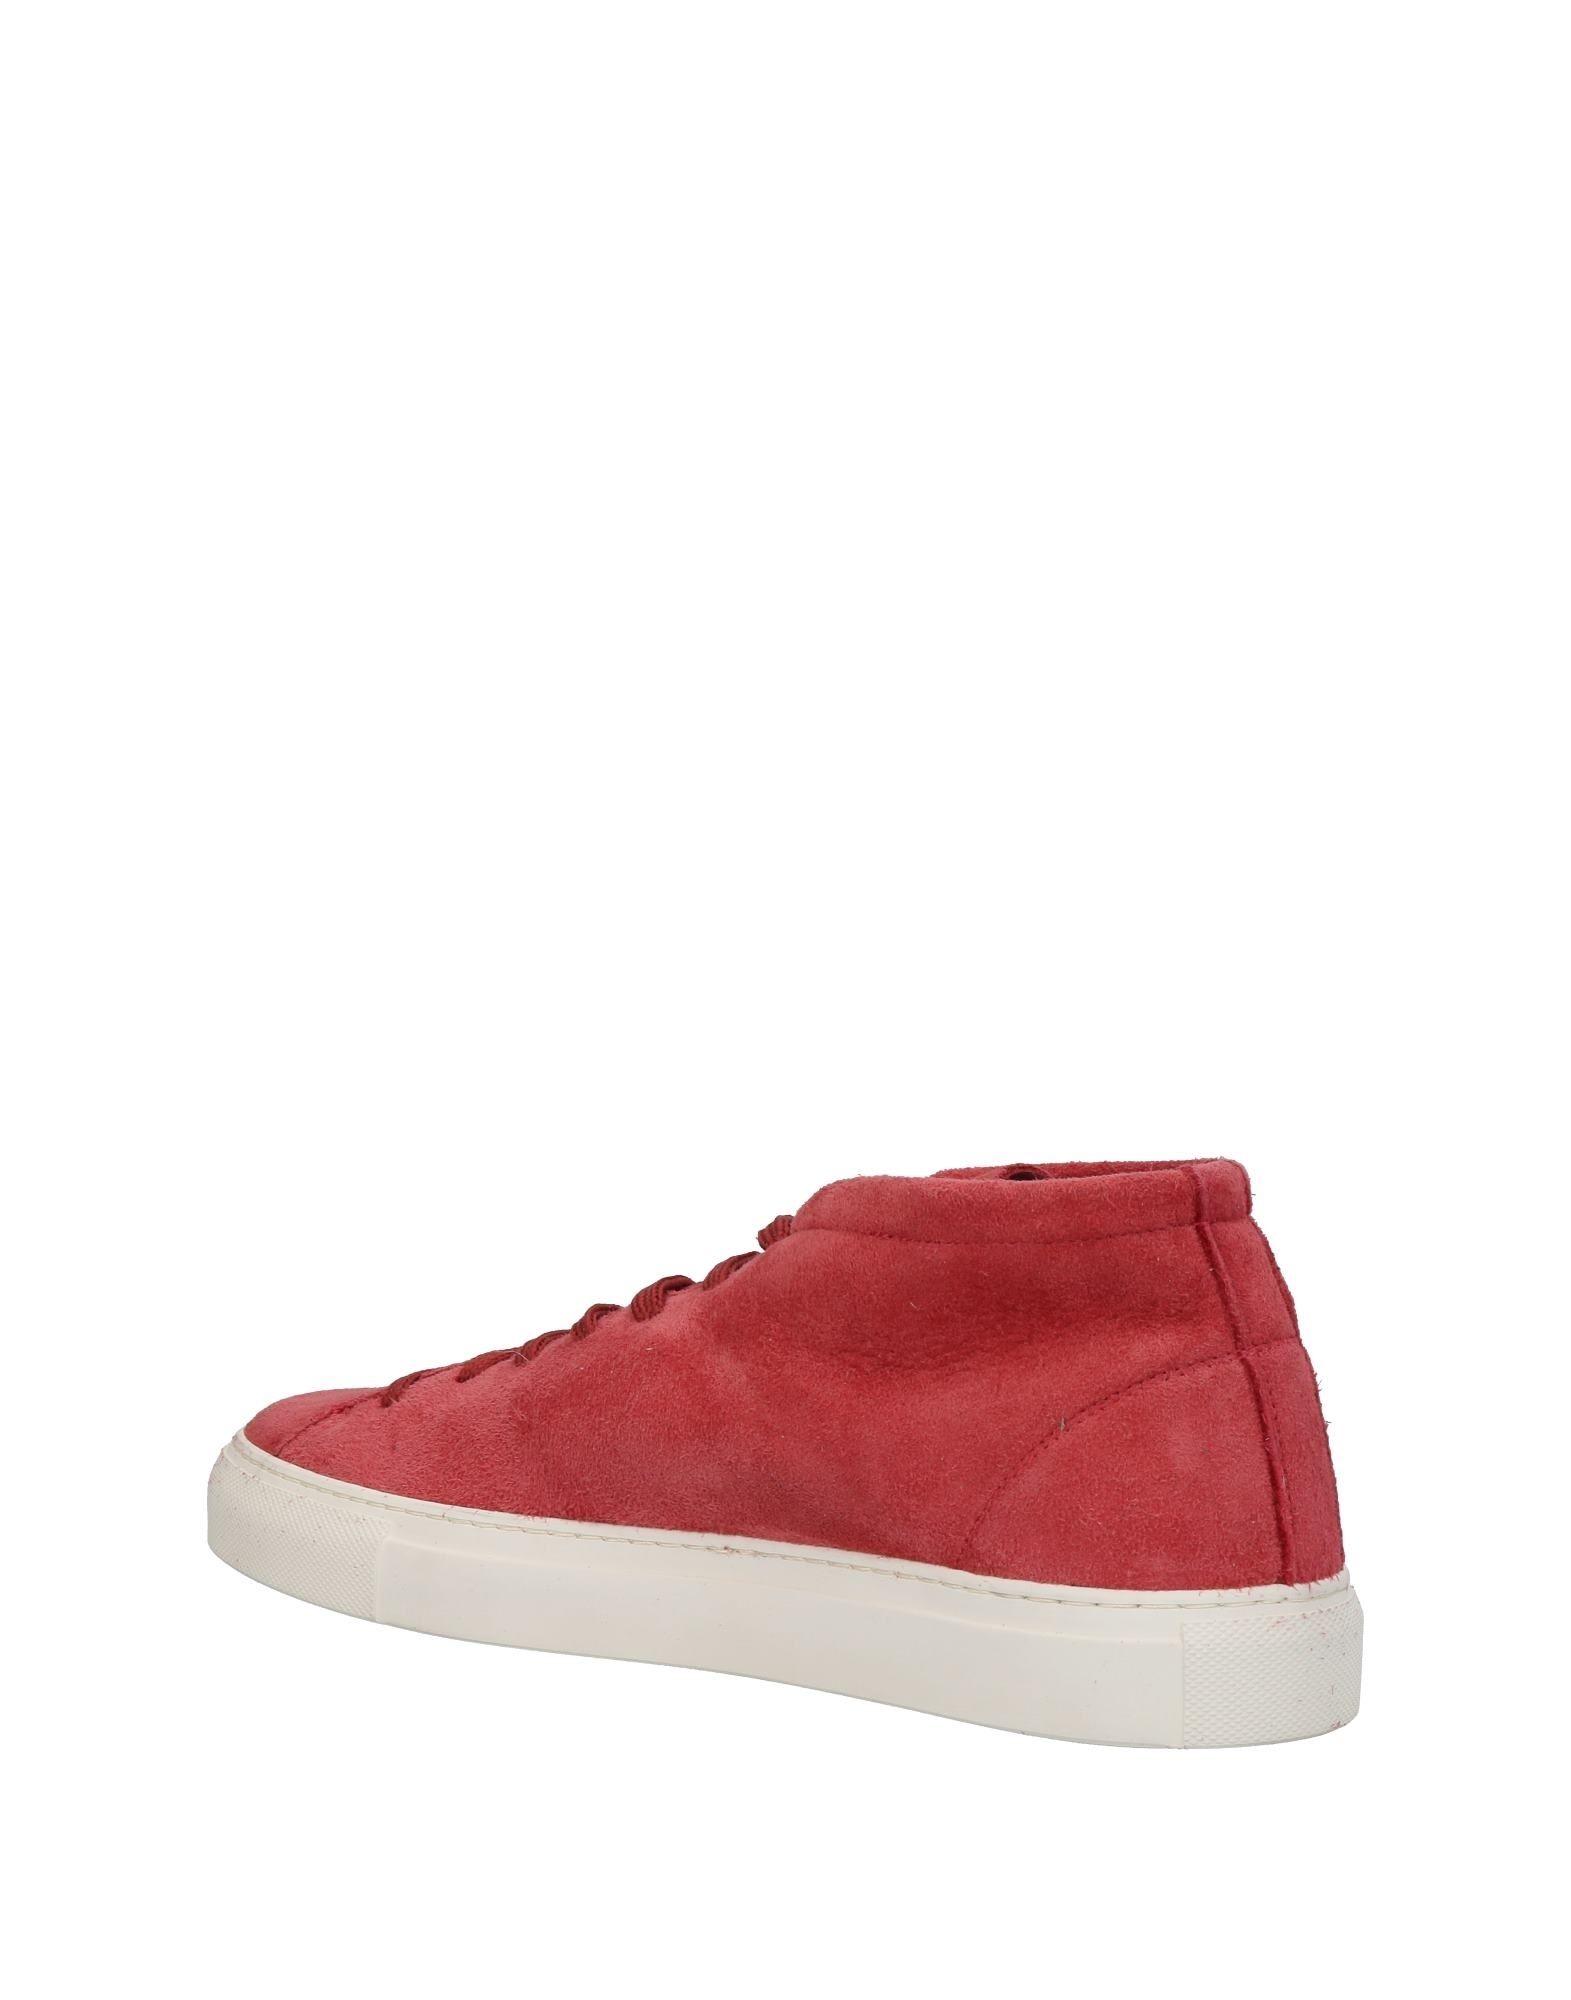 Diemme 11121407HL Sneakers Herren  11121407HL Diemme 577bde